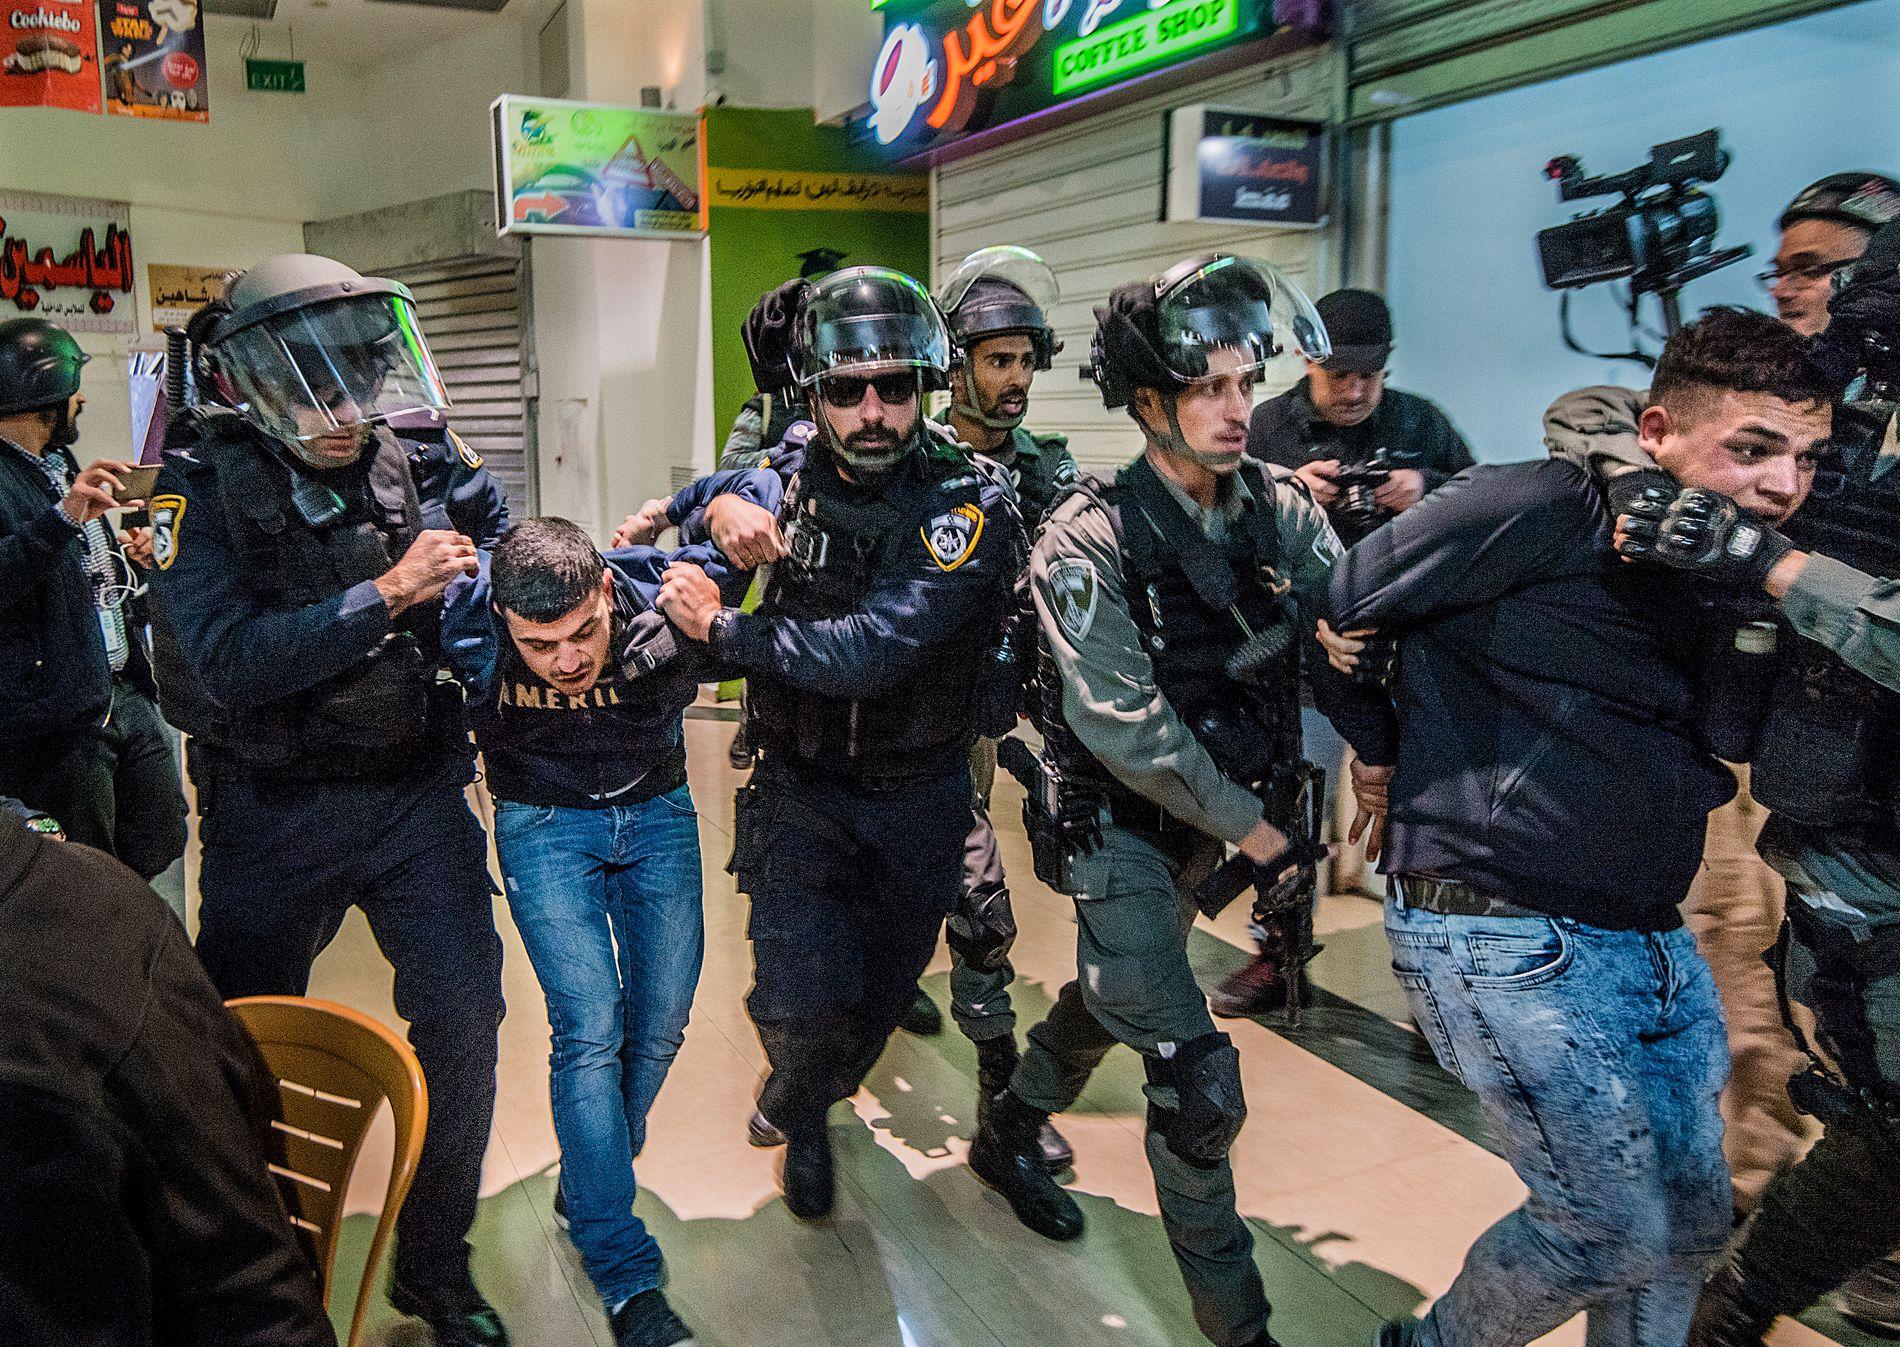 PROTESTER: Det var store protester etter president Donald Trumps erklæring om at Jerusalem er Israels hovedstad, og at den amerikanske ambassaden skal flyttes dit. Disse to unge guttene ble jaget av politiet og arrestert inne på et kjøpesenter i Øst Jerusalem.